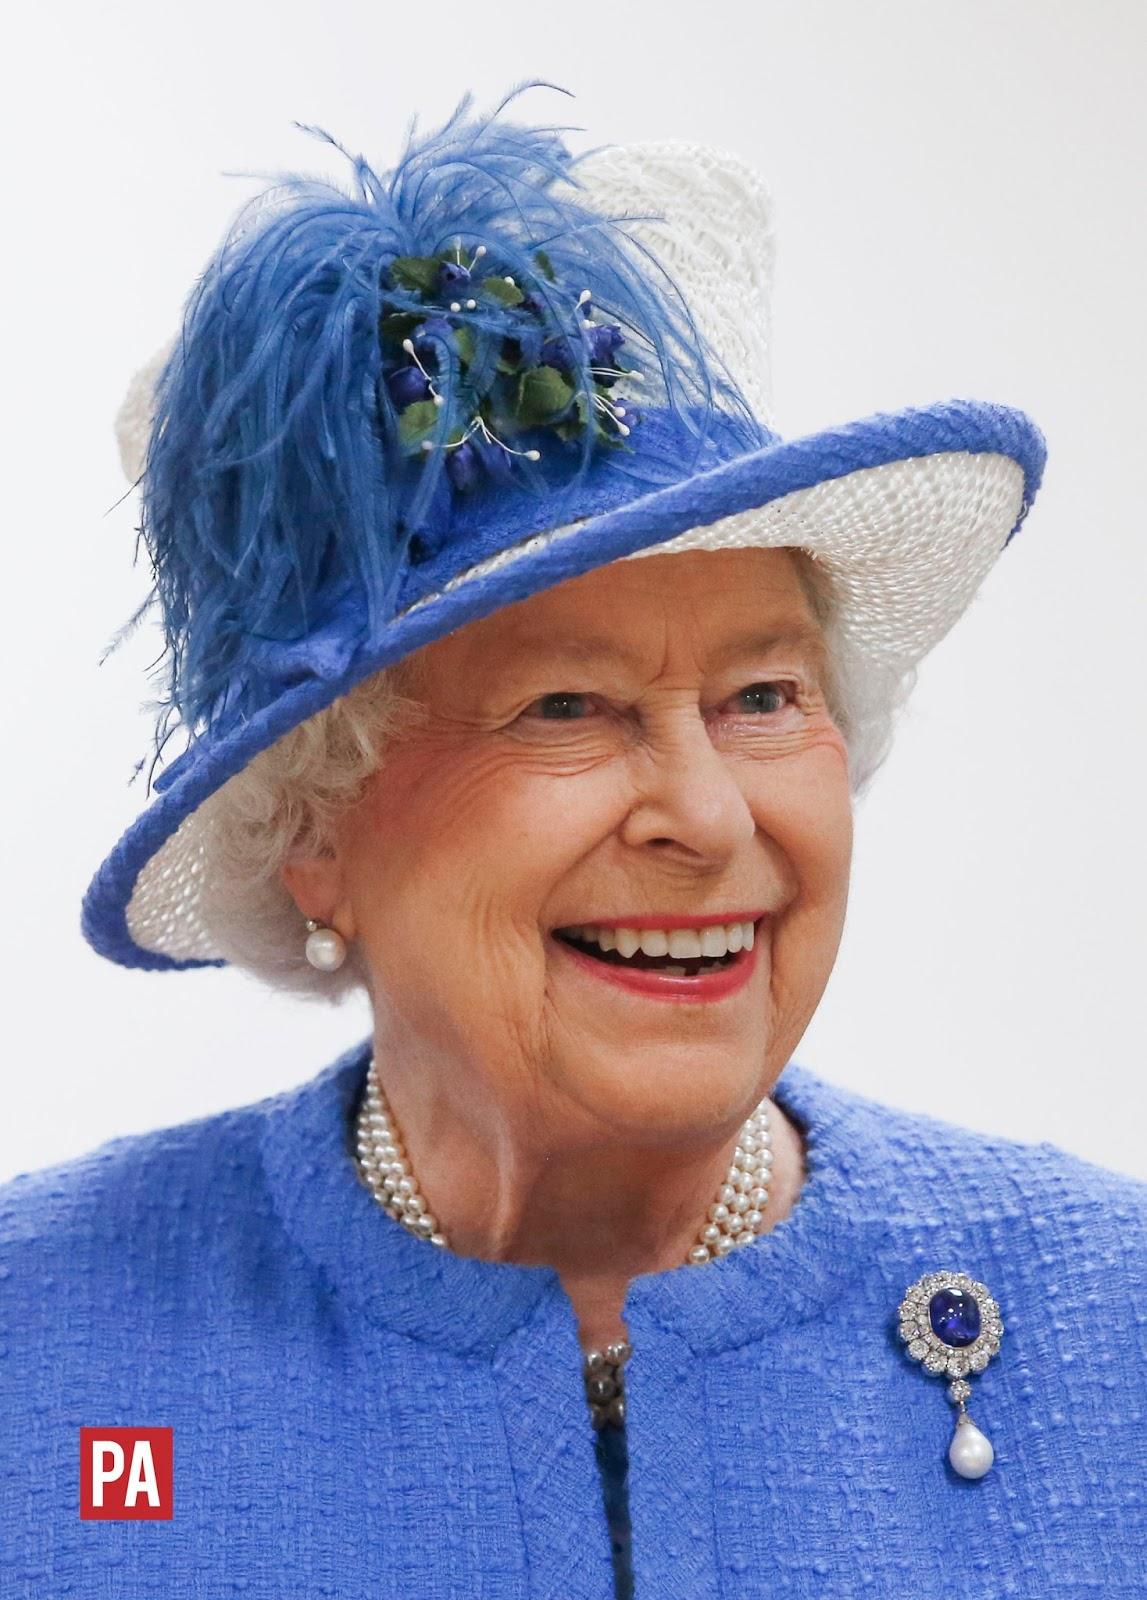 the queen - photo #21